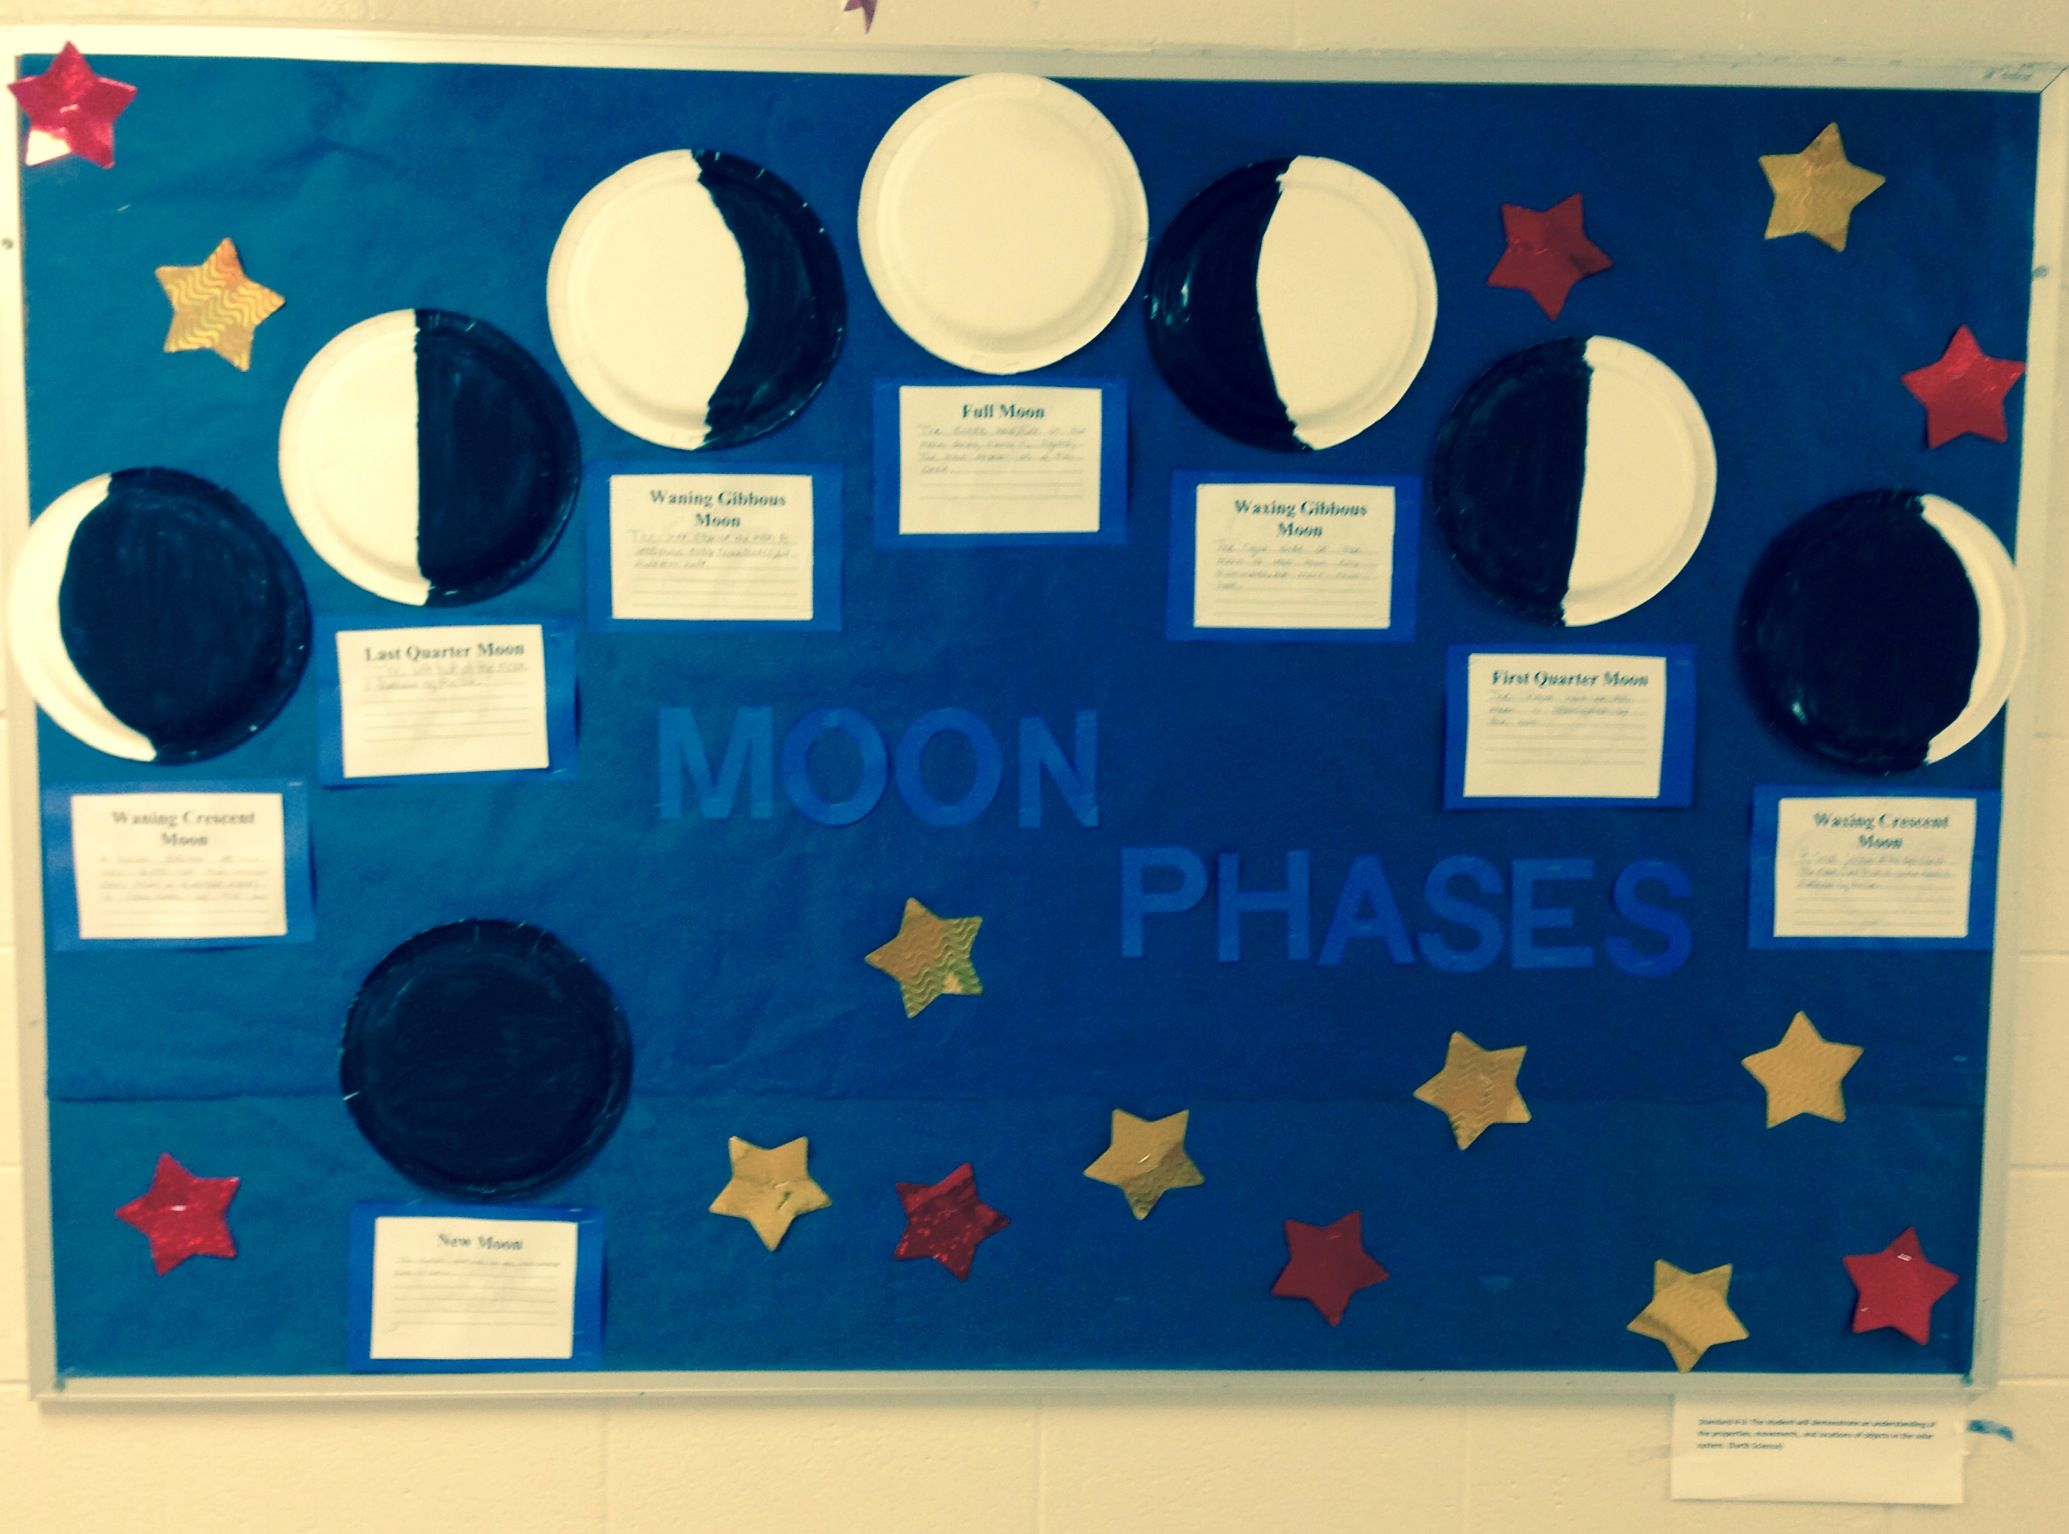 My Moon Phases Bulletin Board